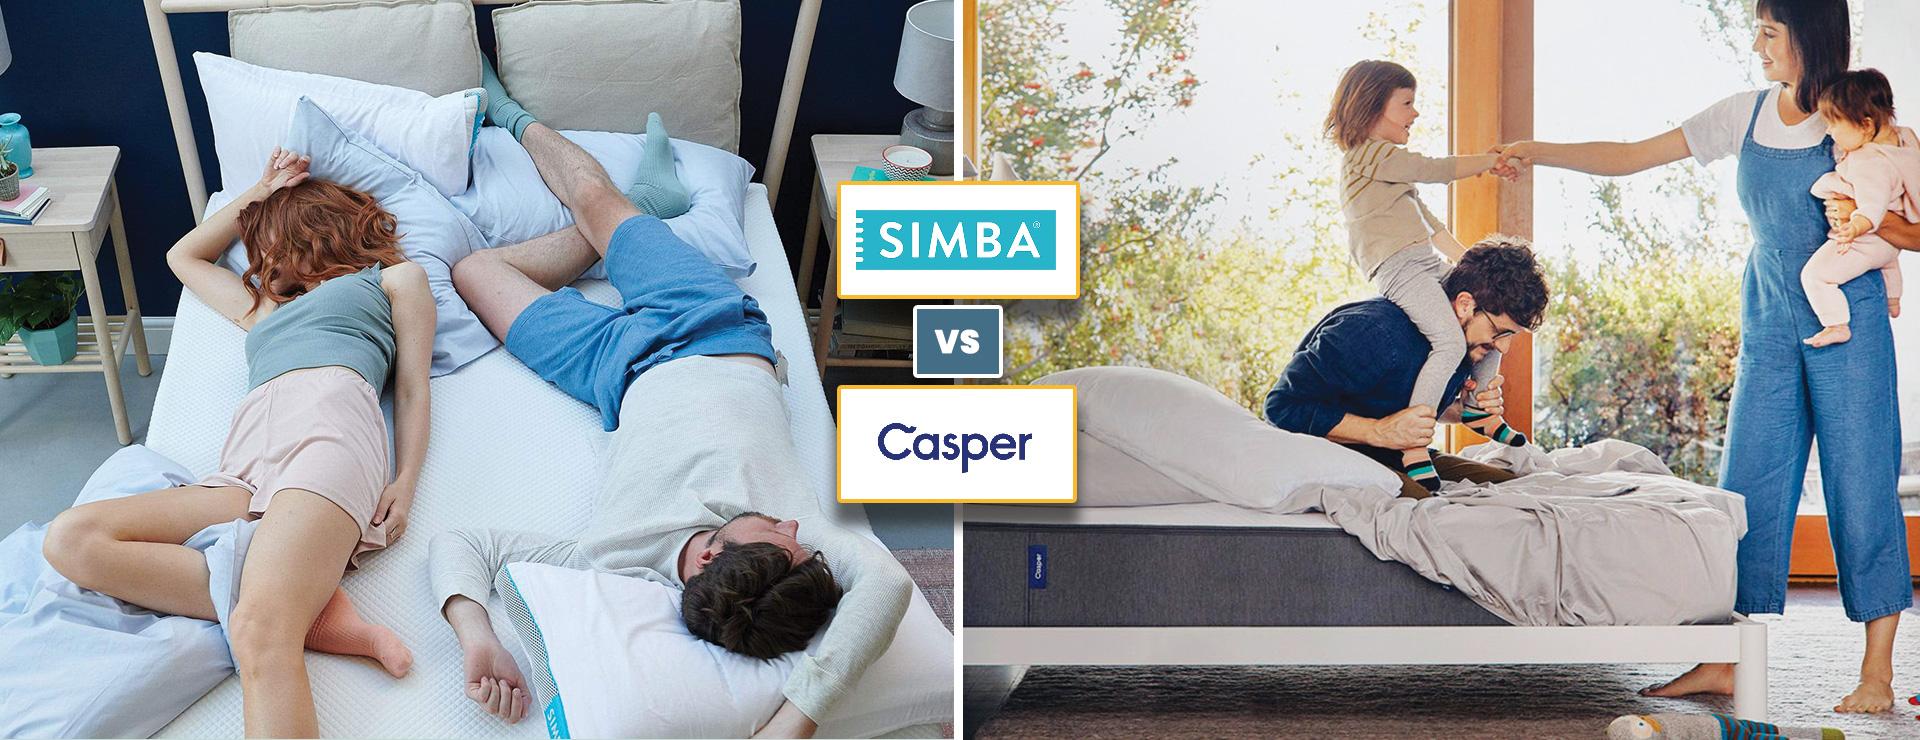 Simba-vs-Casper